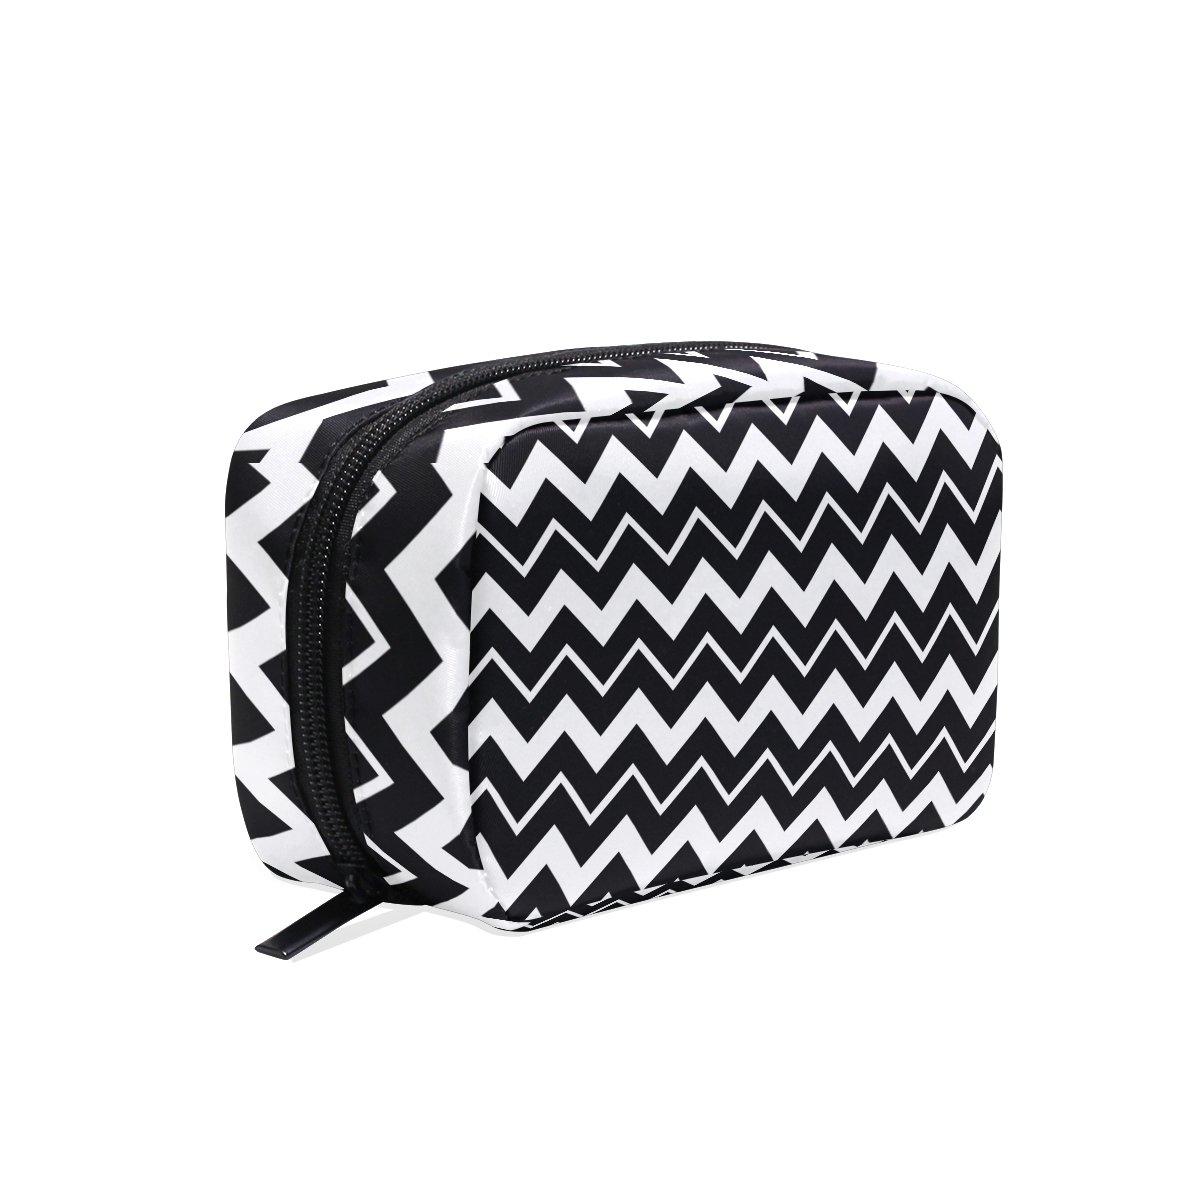 5e460ca9b7 Lorvies black chevron cosmetic pouch clutch makeup bag travel organizer case  toiletry pouch for women beauty